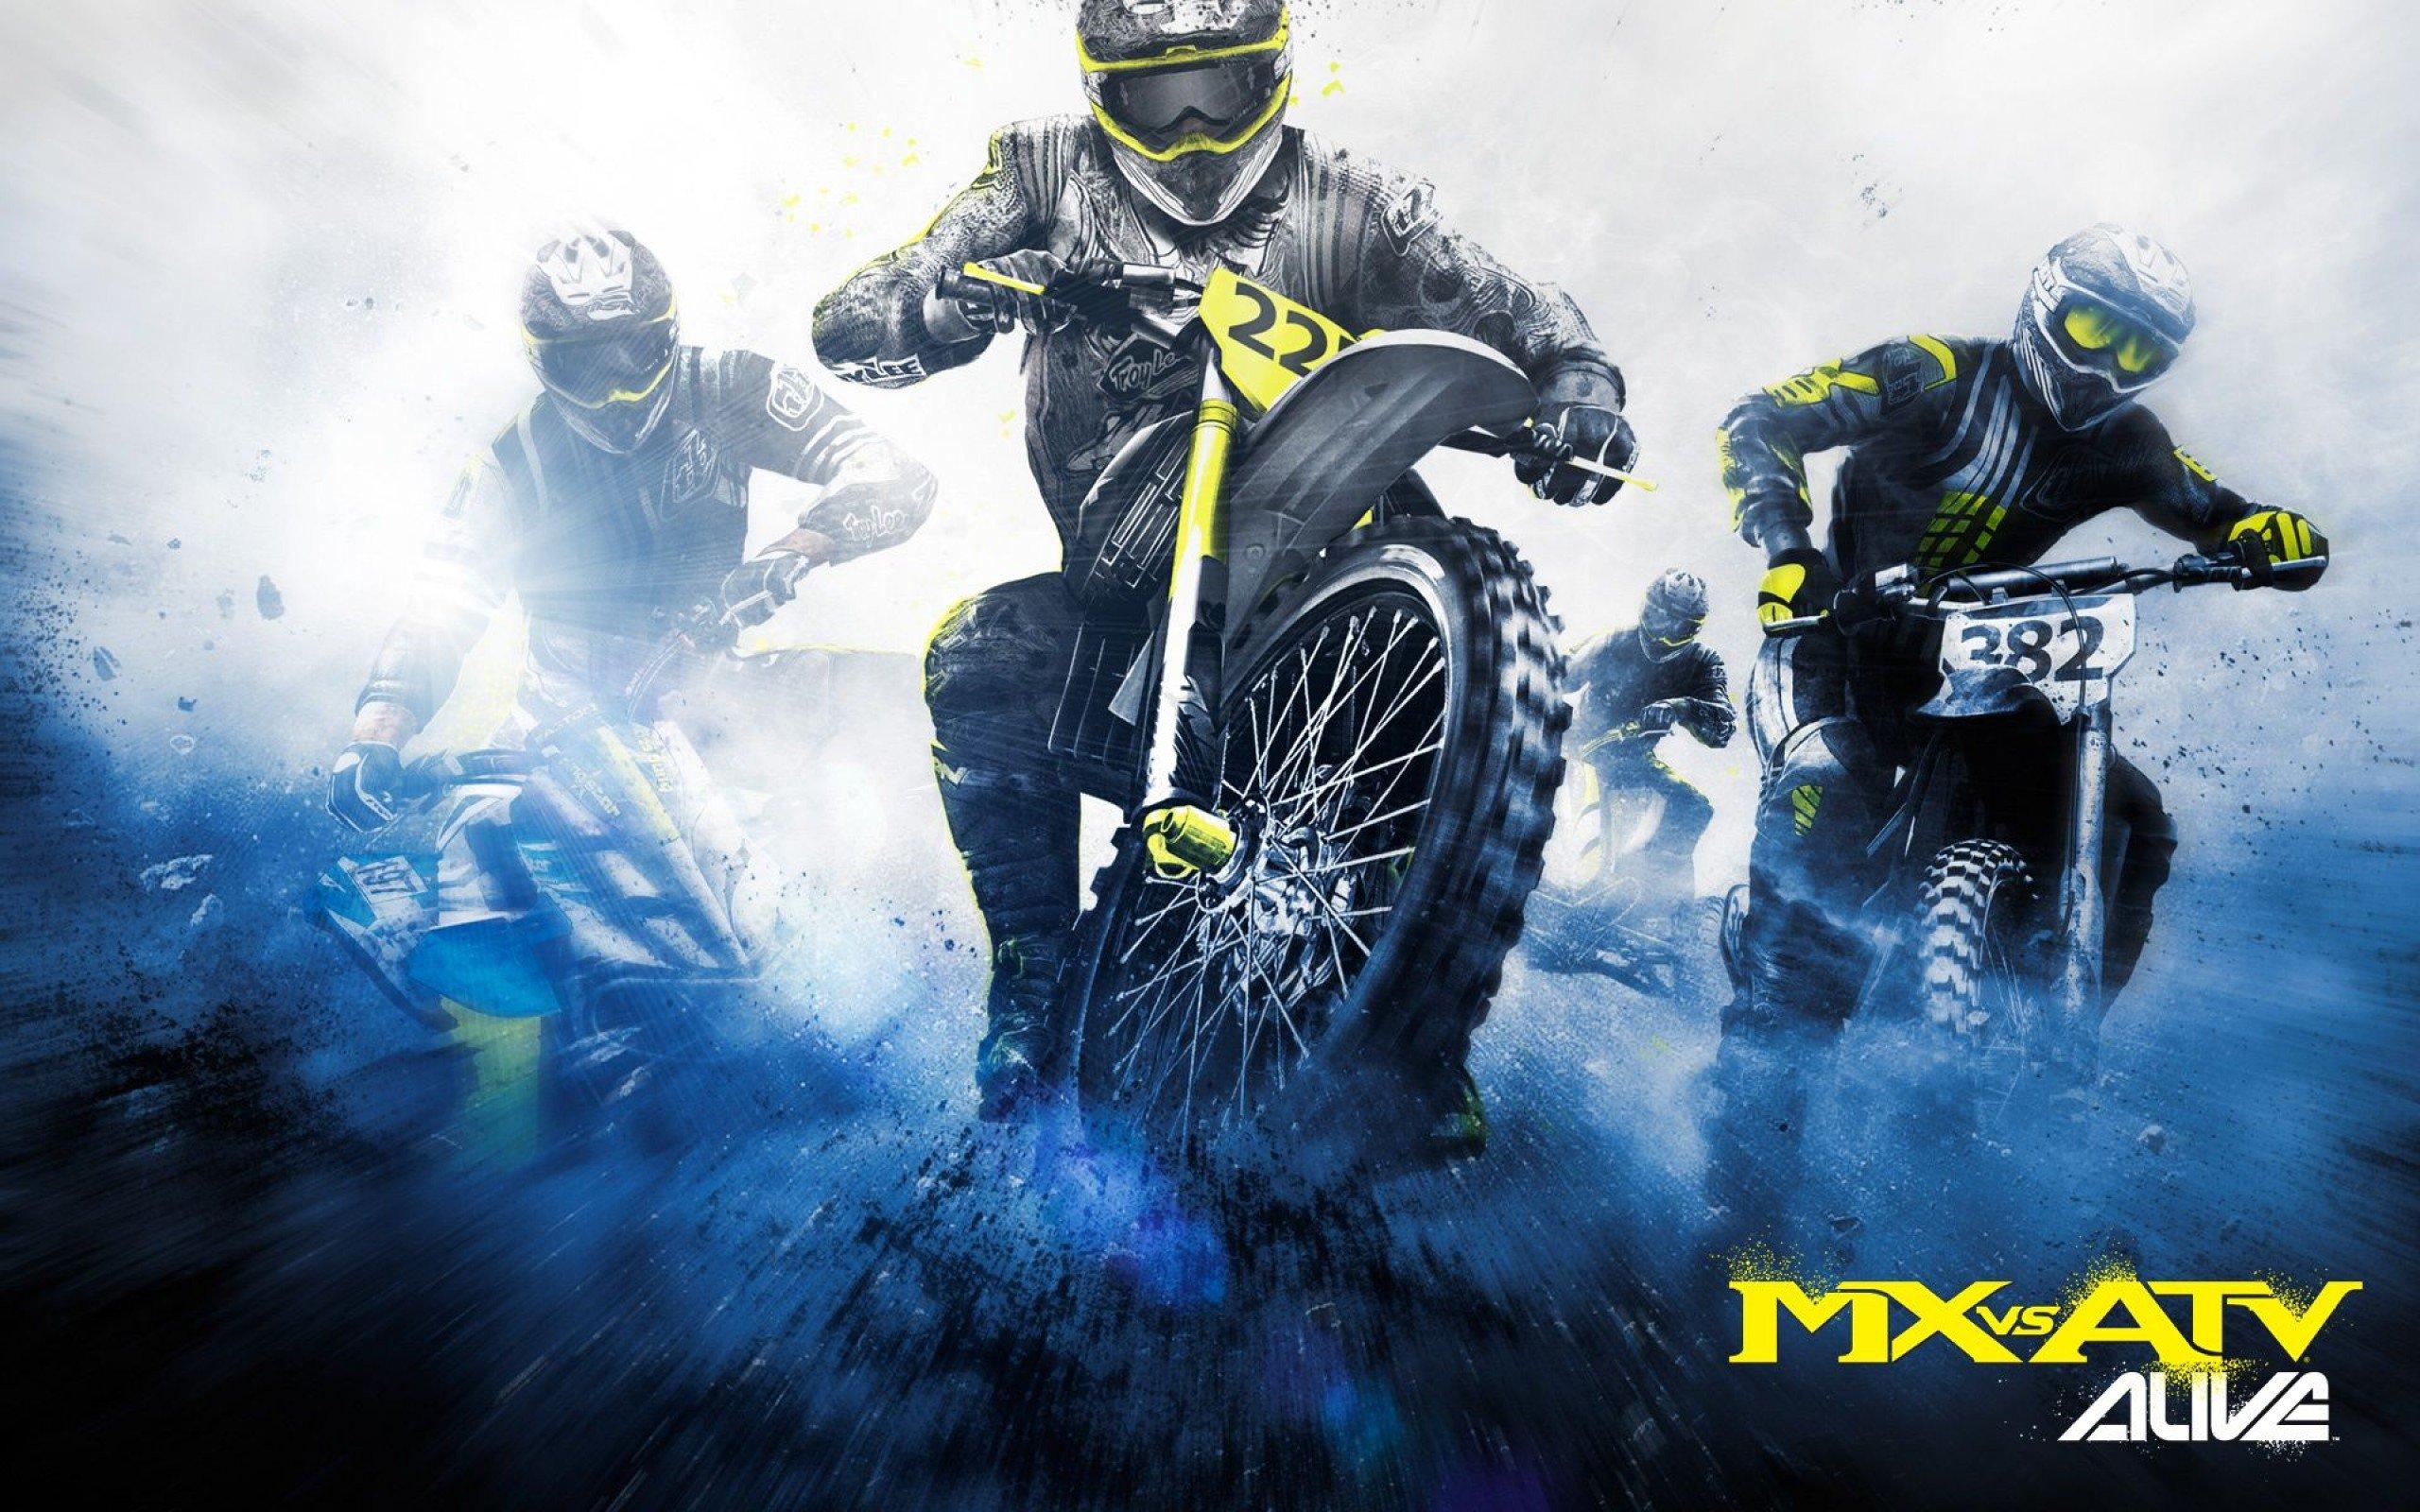 ATV 4x4 Offroad Motorbike Bike Motorcycle Quad Moto